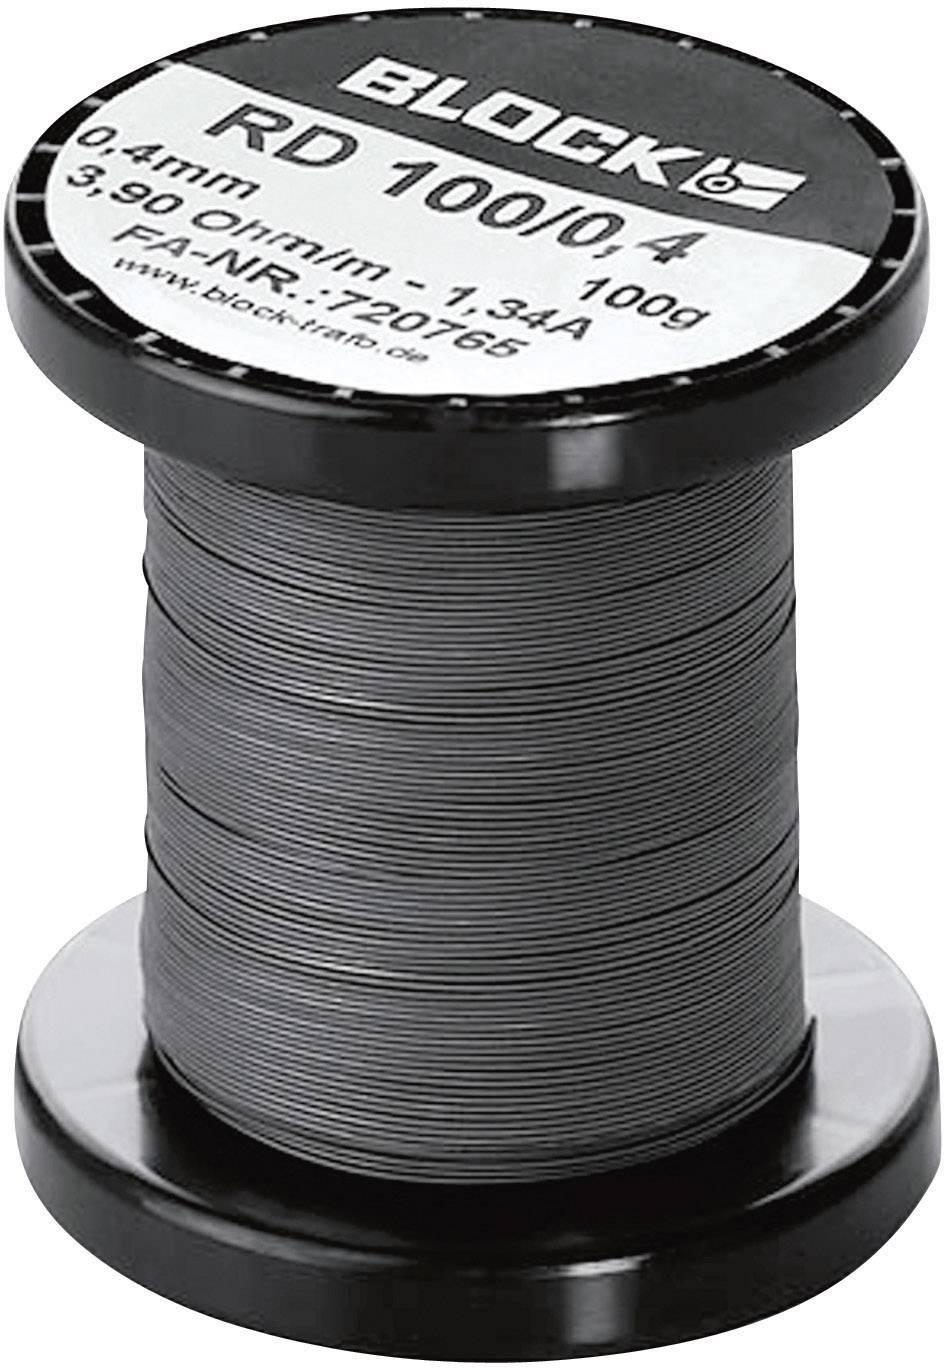 Odporový drát (konstantan) 3.9 Ω/m Block RD 100/0,4 89 m